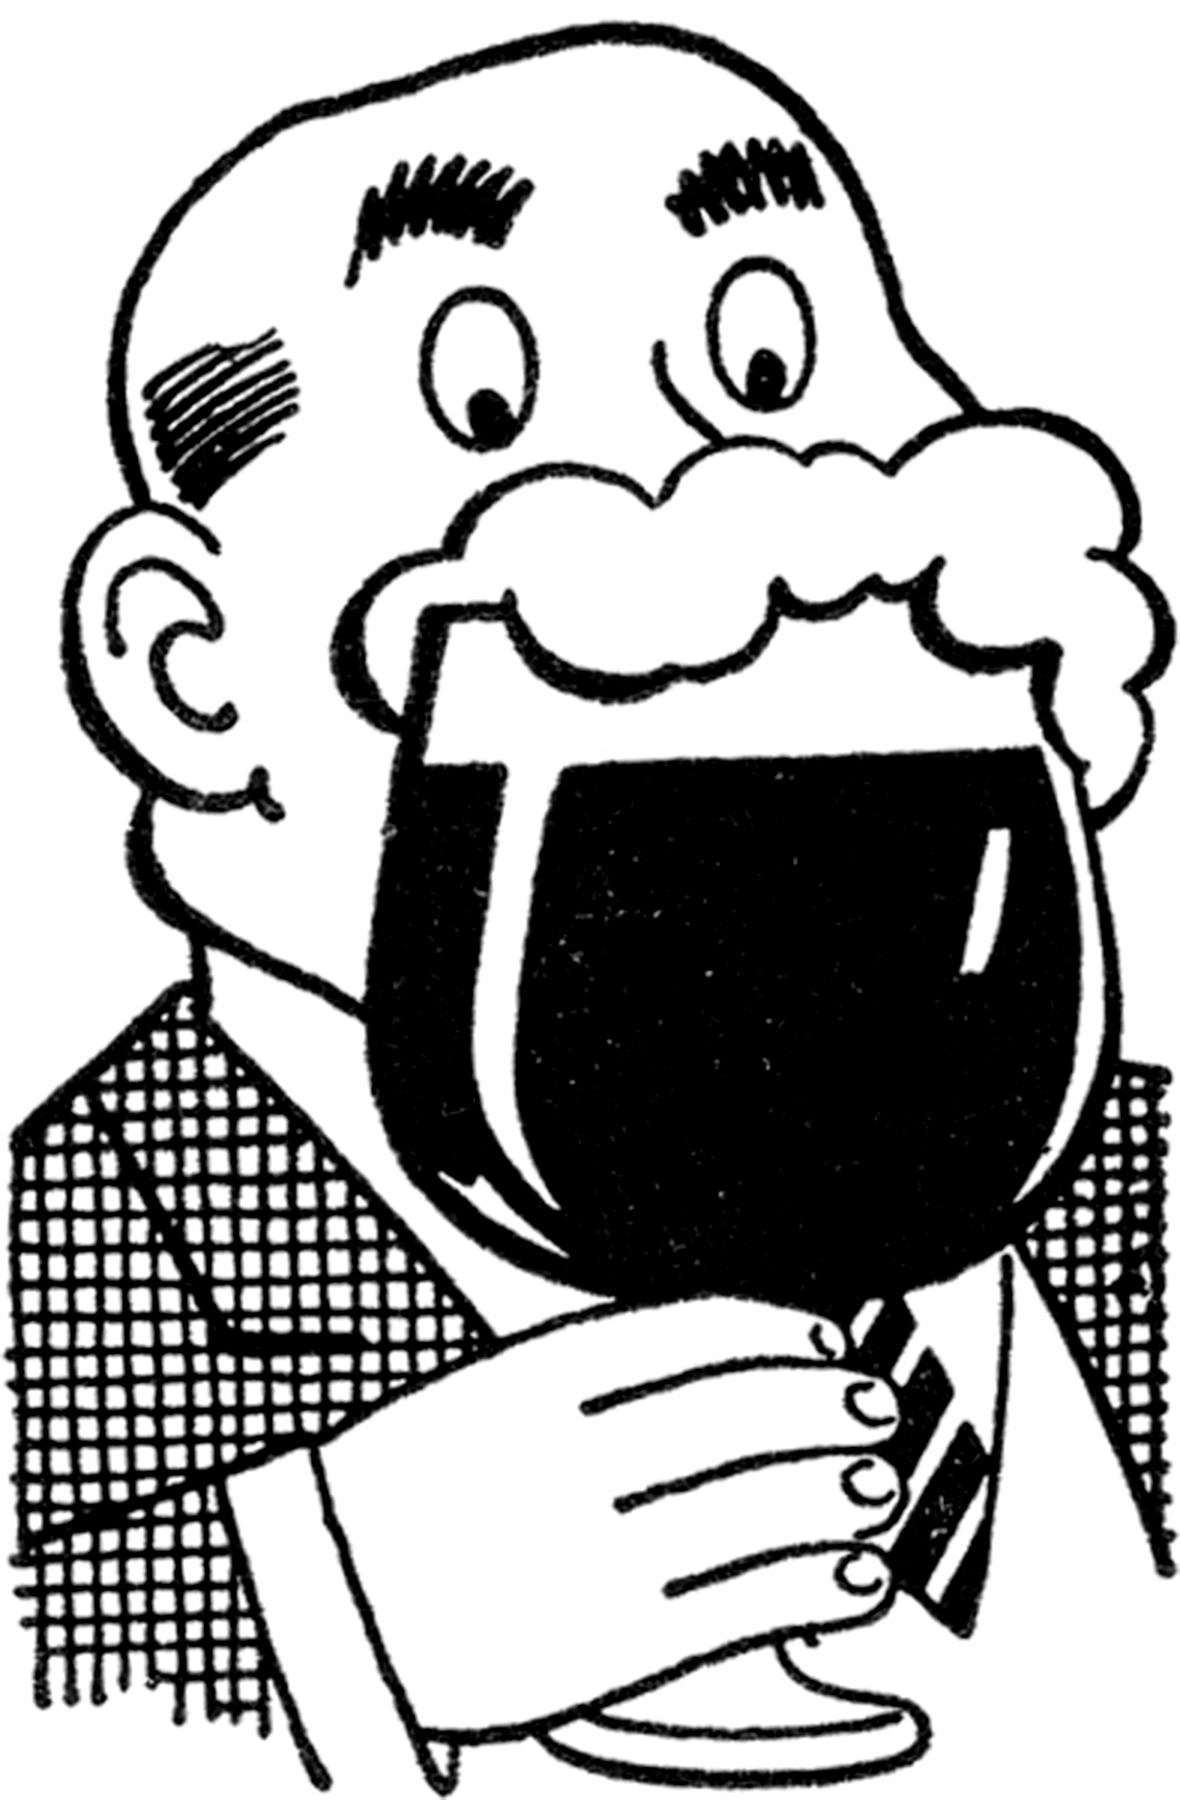 Retro Beer Man Image! - The Graphics Fairy